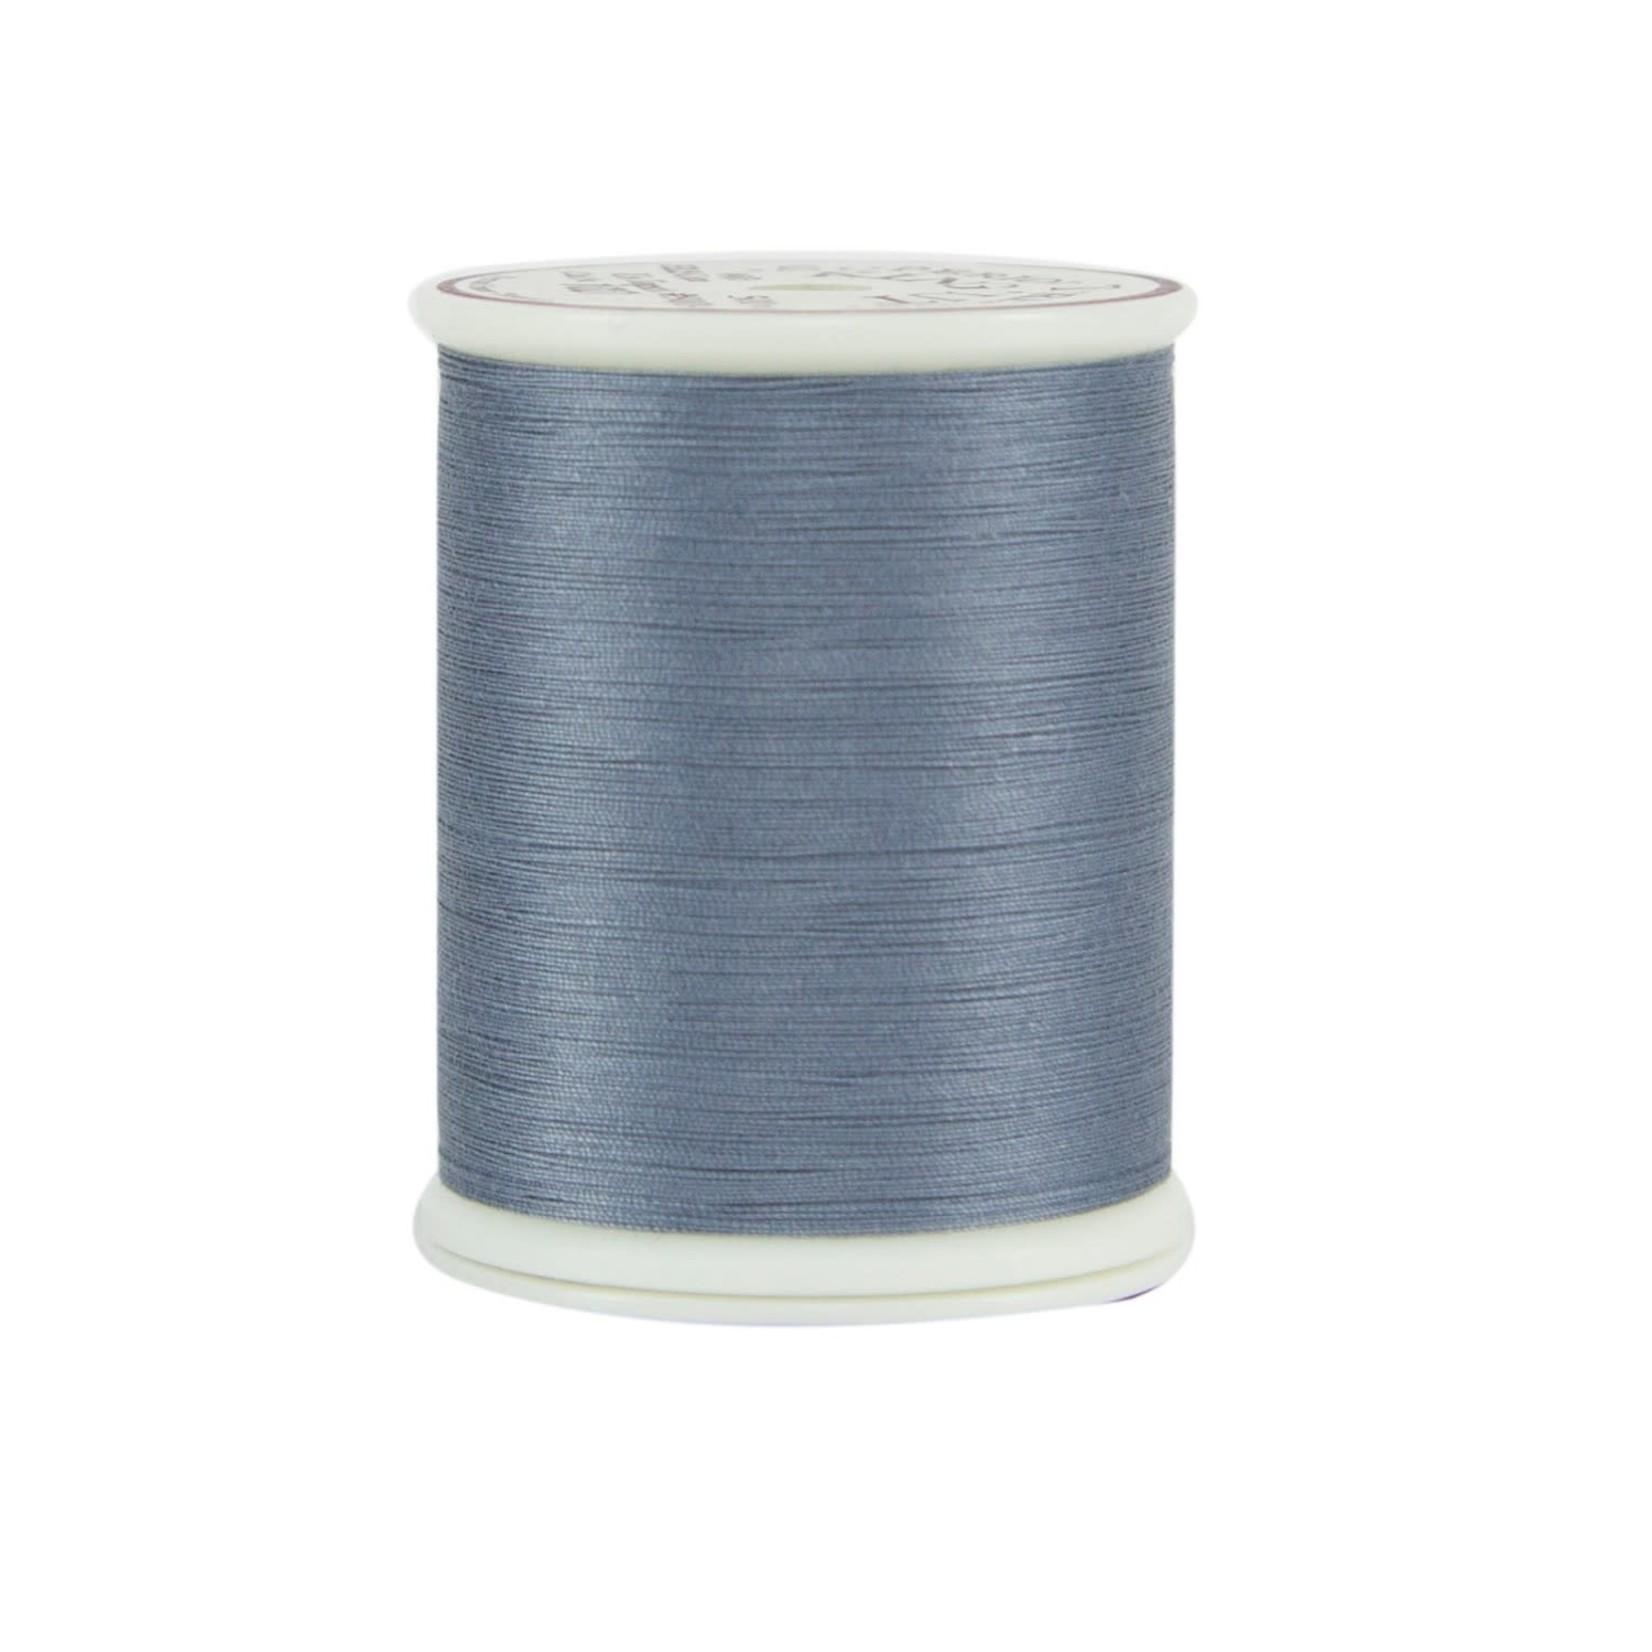 Superior Threads King Tut - #40 - 457 m - 1027 Pewter